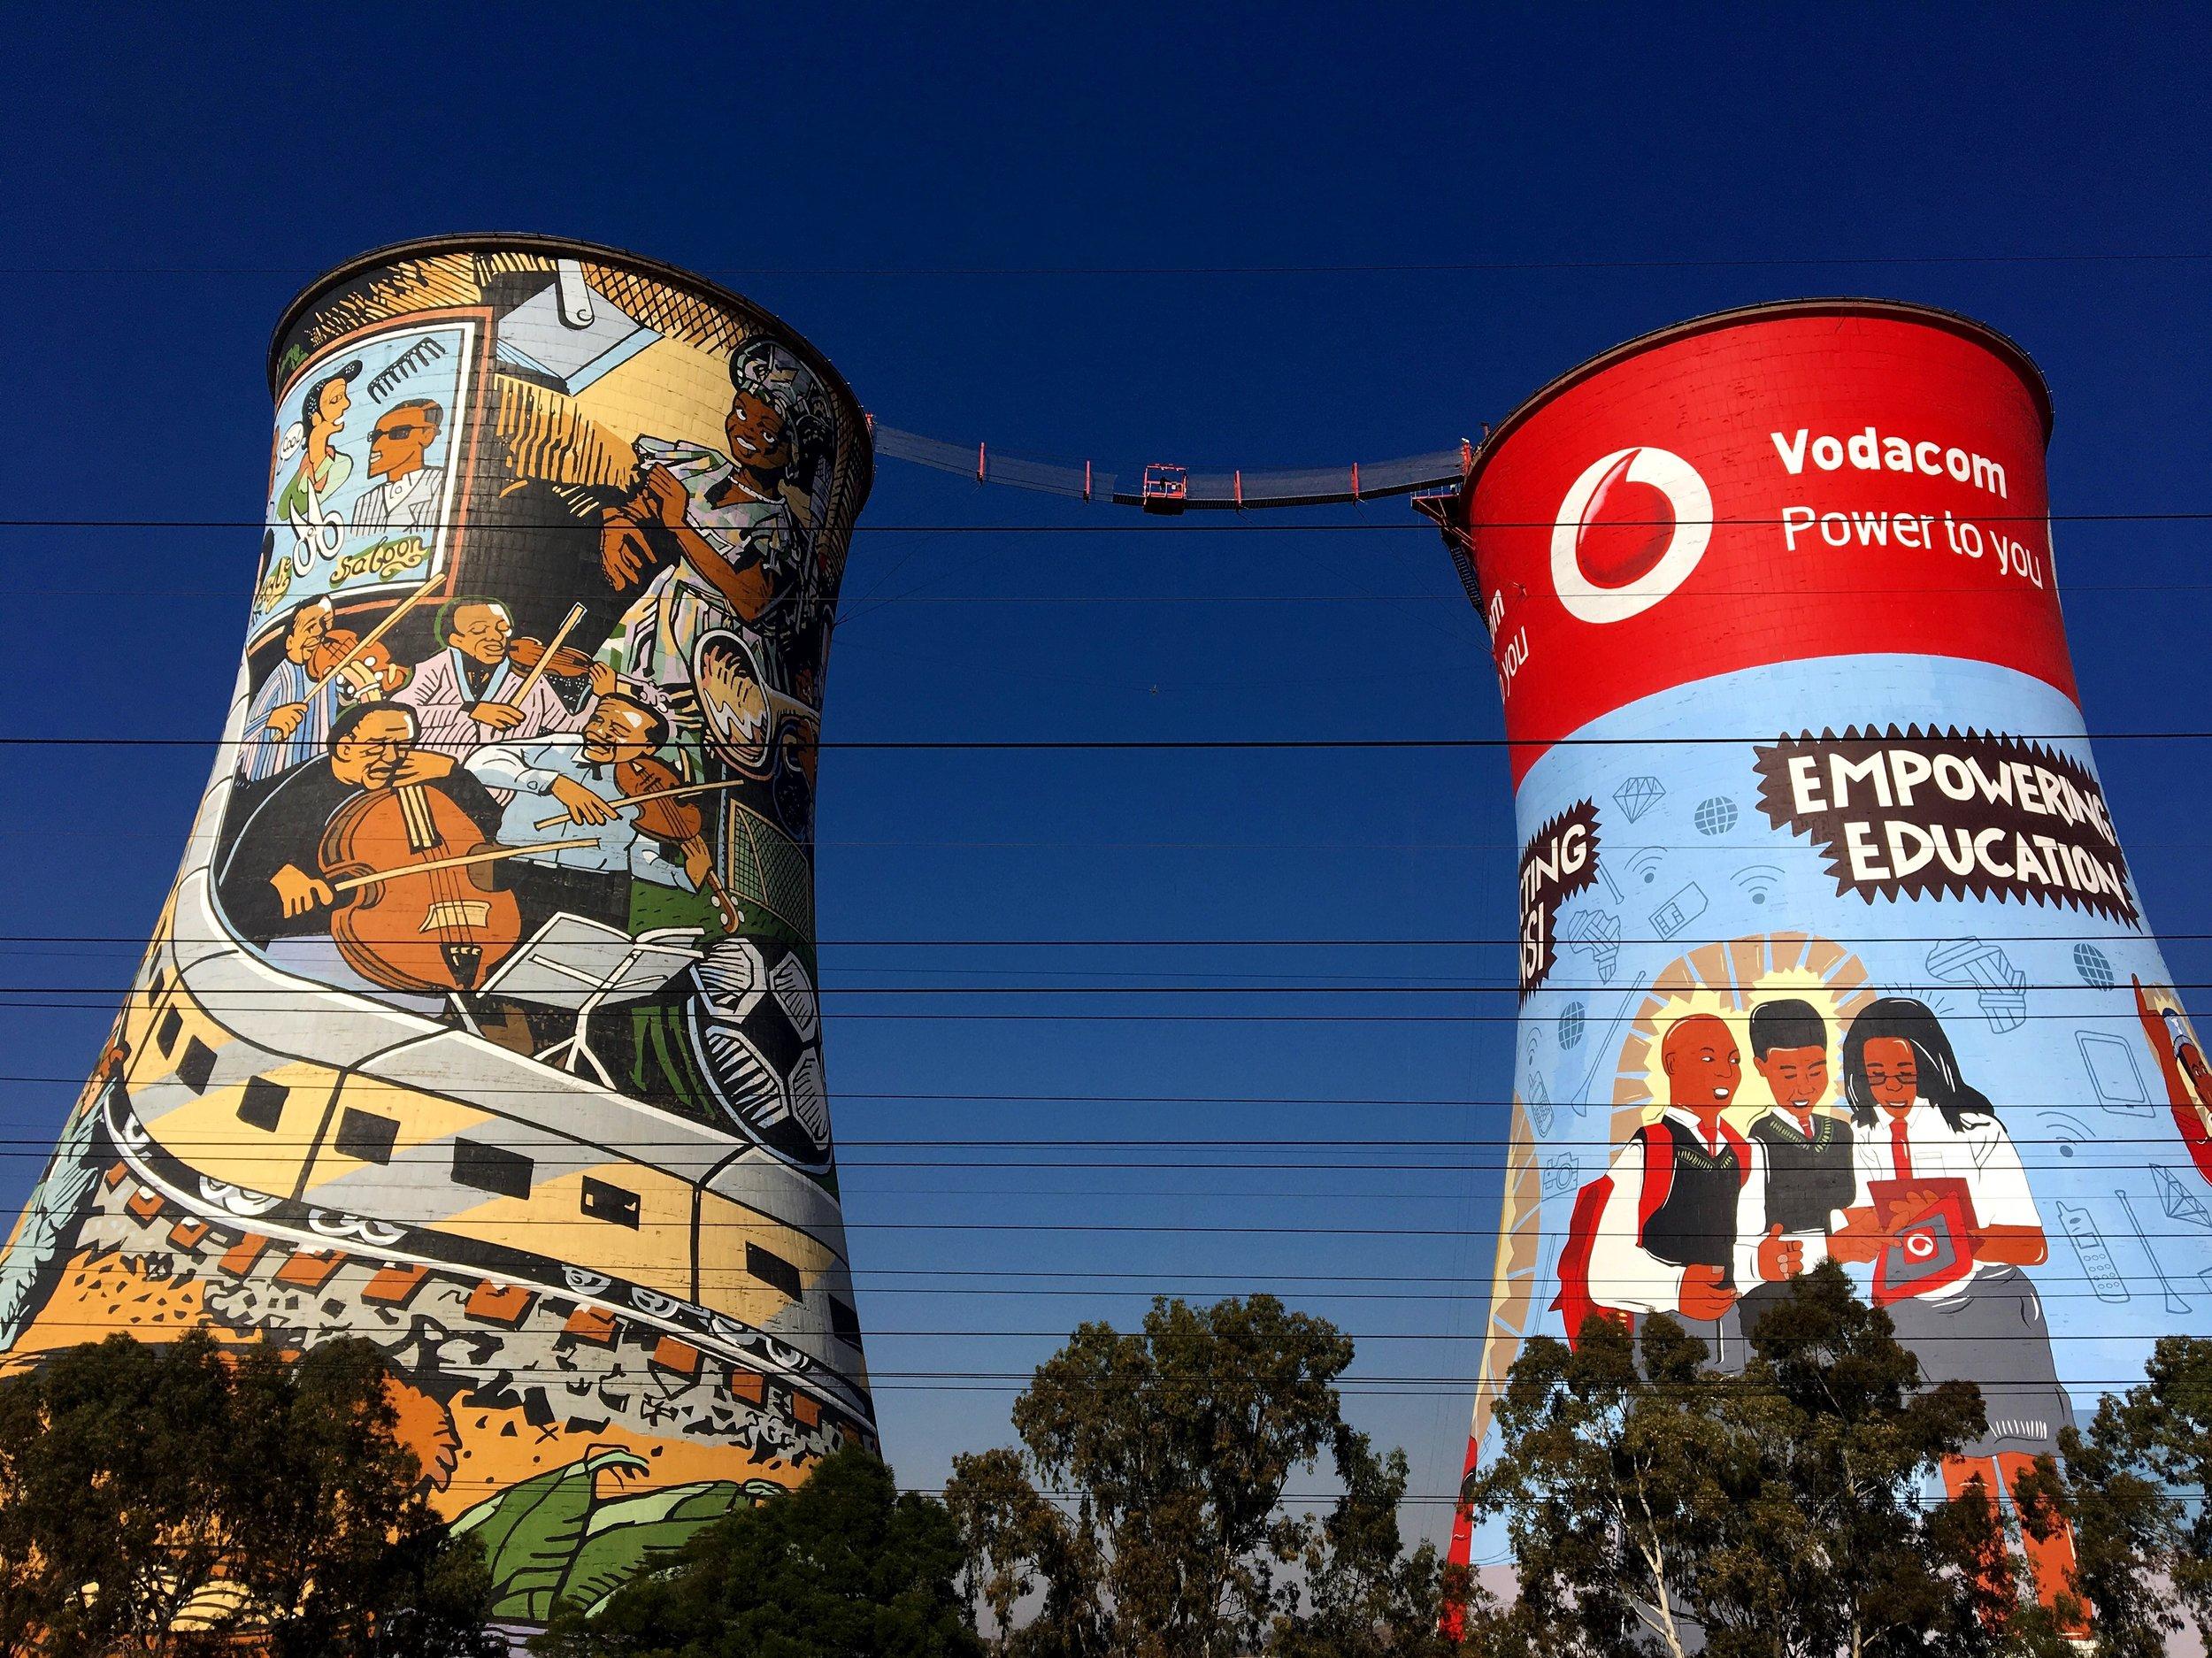 Orlando Towers / Johannesburg / South Africa